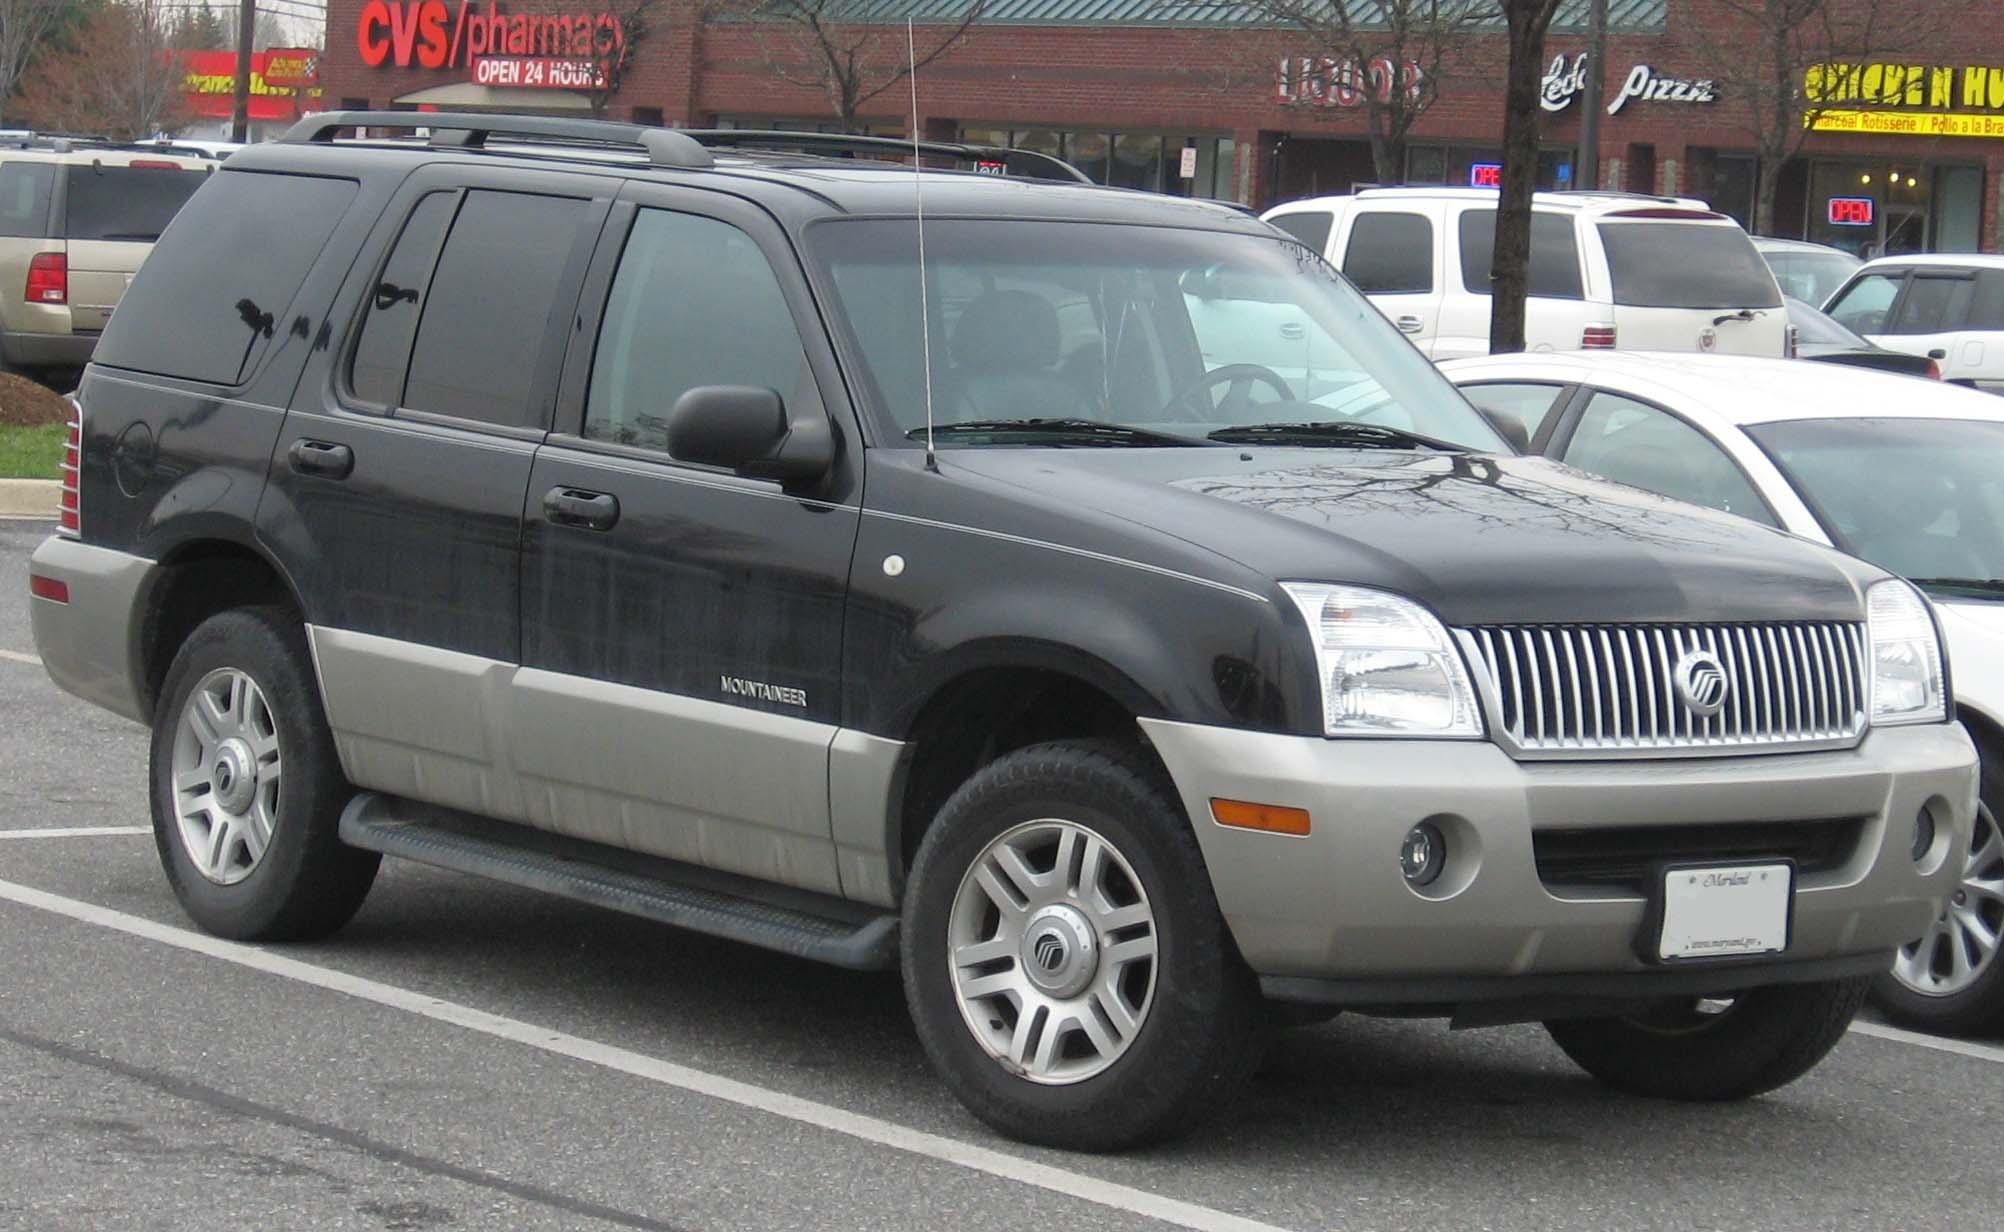 2007 Buick Lucerne Black >> File:2002-2005 Mercury Mountaineer.jpg